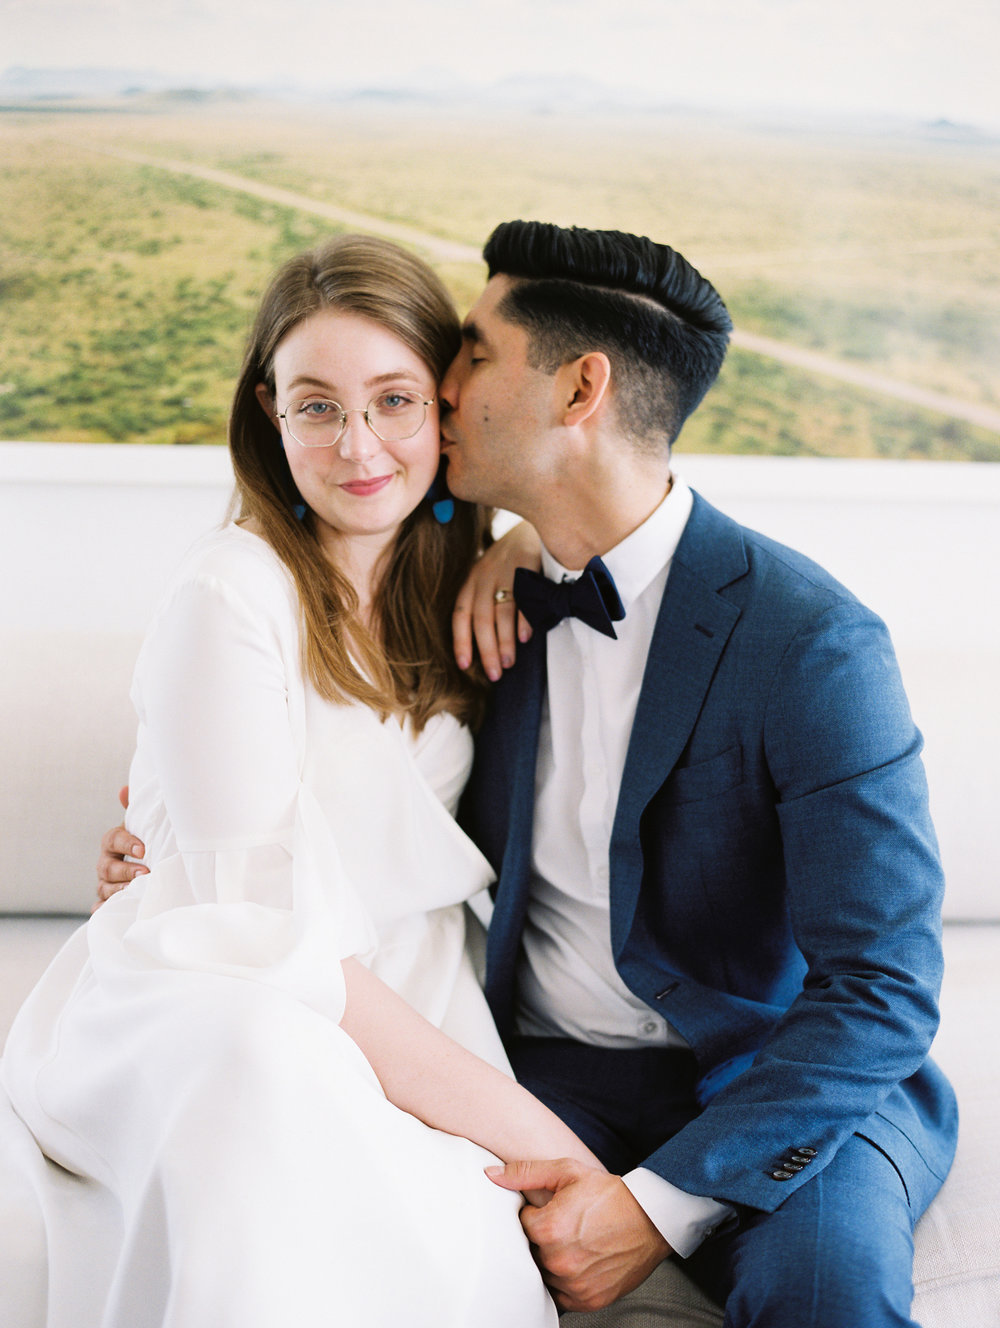 Best-Austin-Texas-Marfa-Wedding-Photographers-fine-art-film-133.jpg